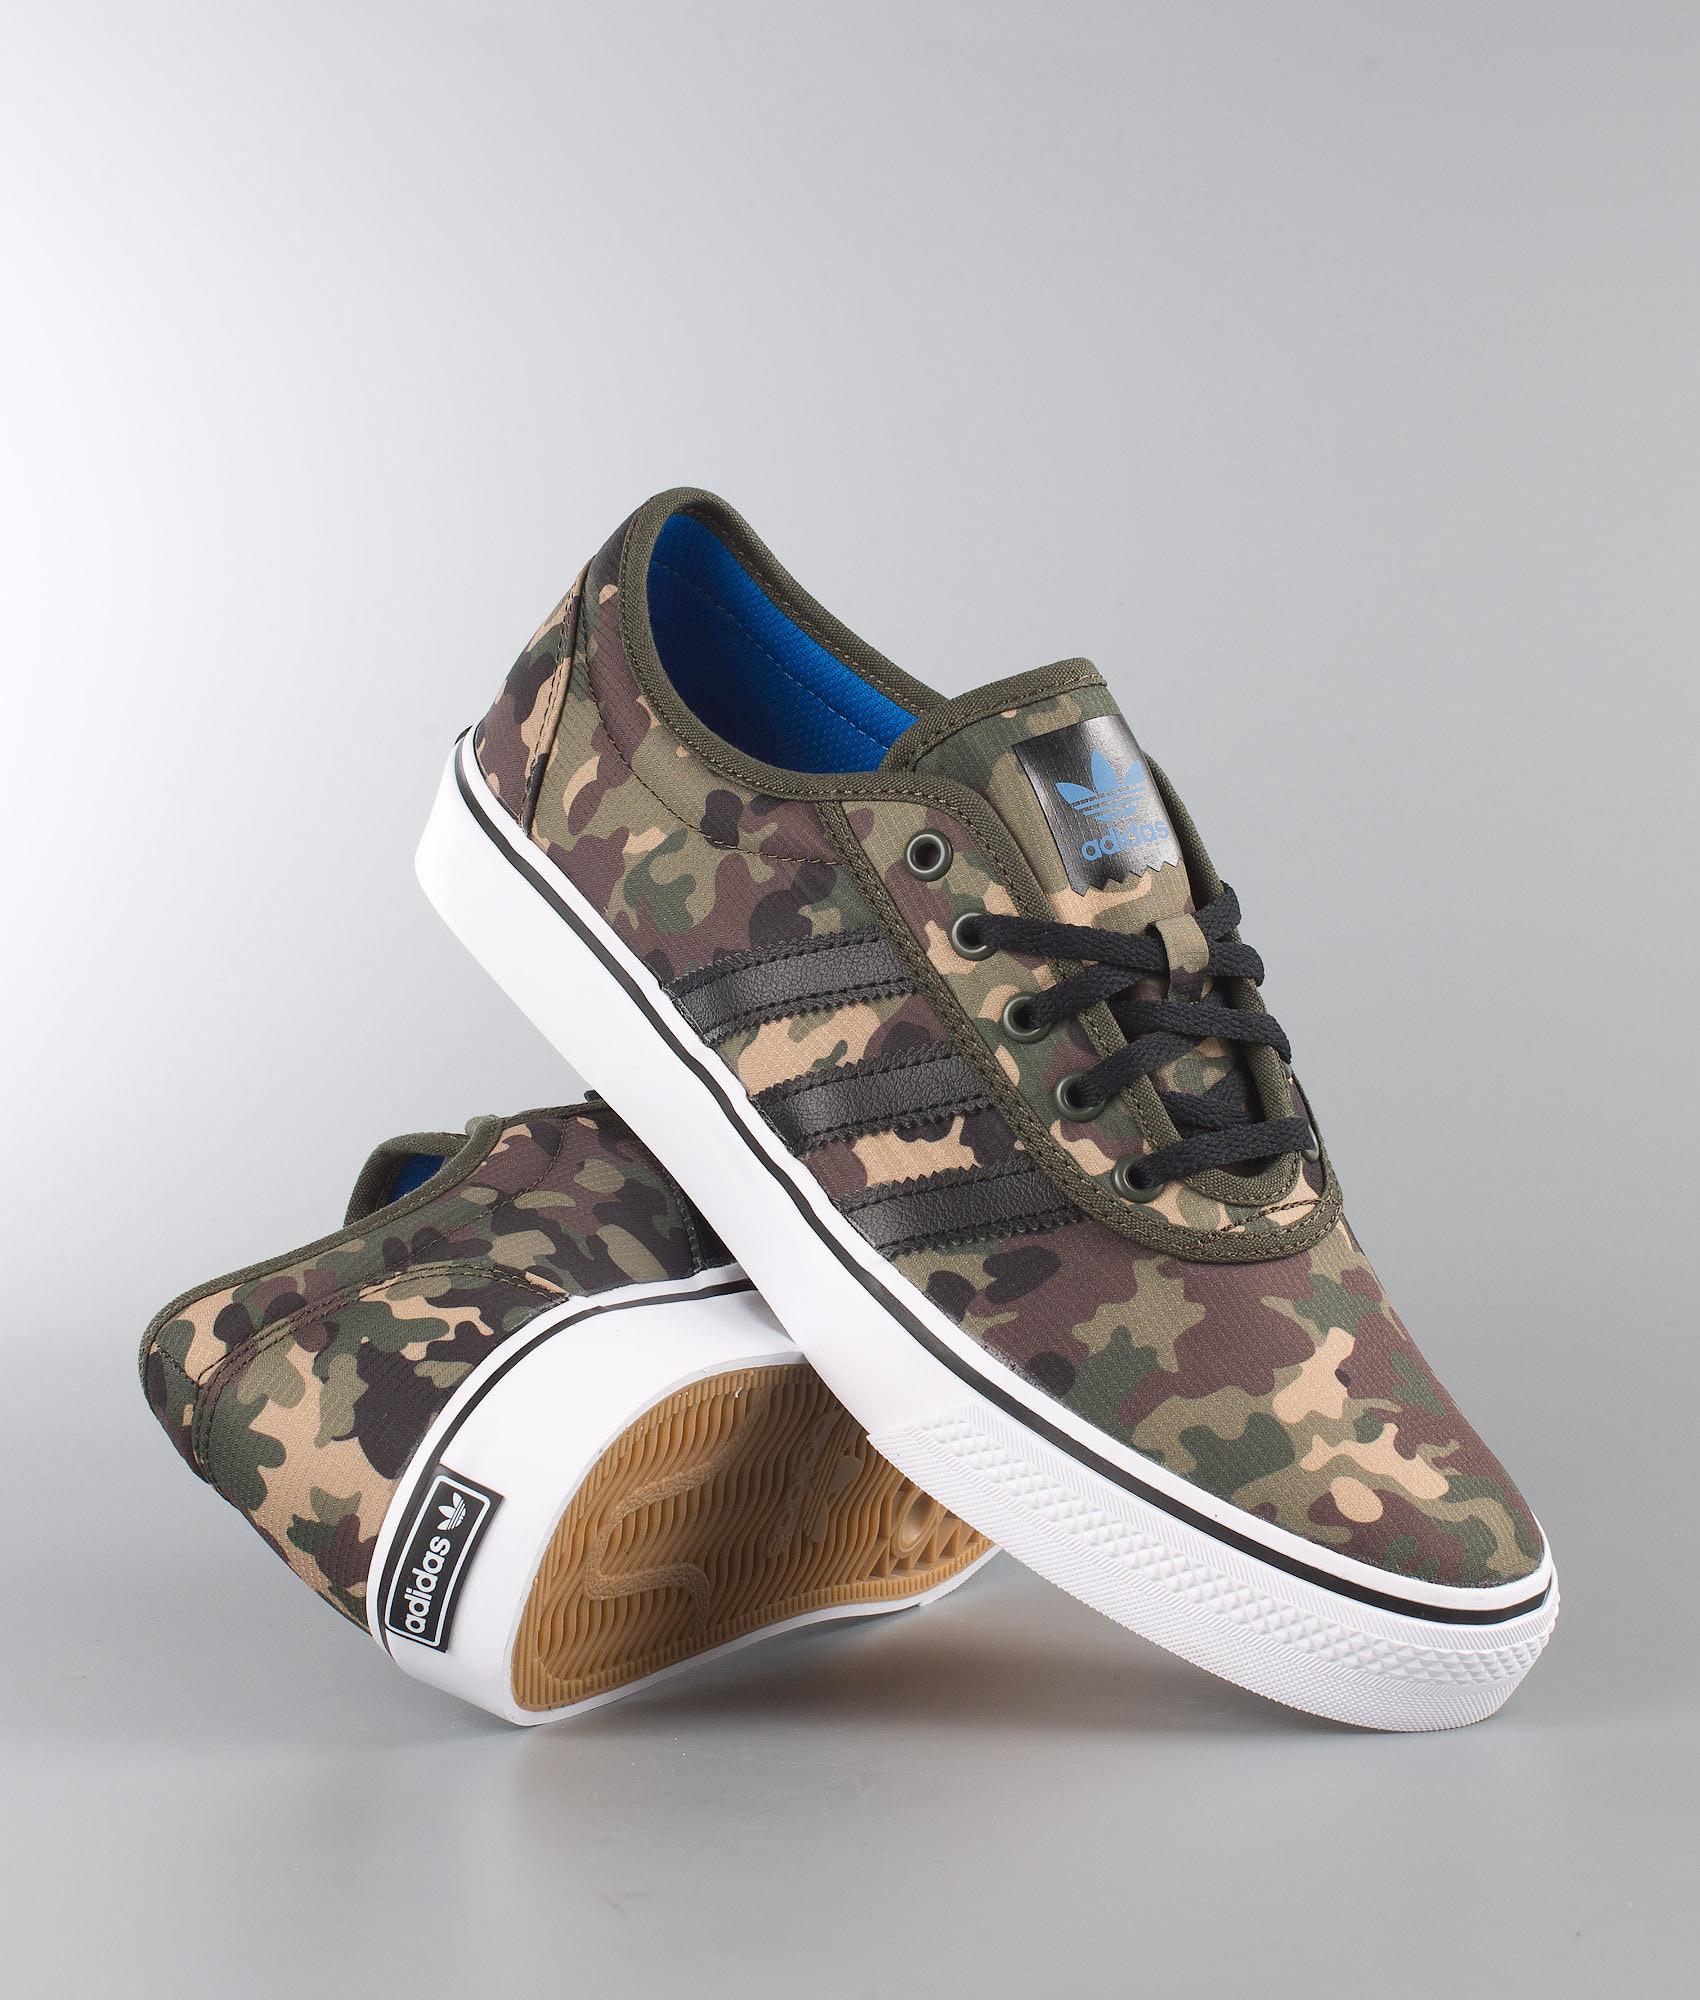 30edc79a05b7c Adidas Skateboarding Adi-Ease Shoes Ngtcar/Cblack/Ftwwht - Ridestore.com